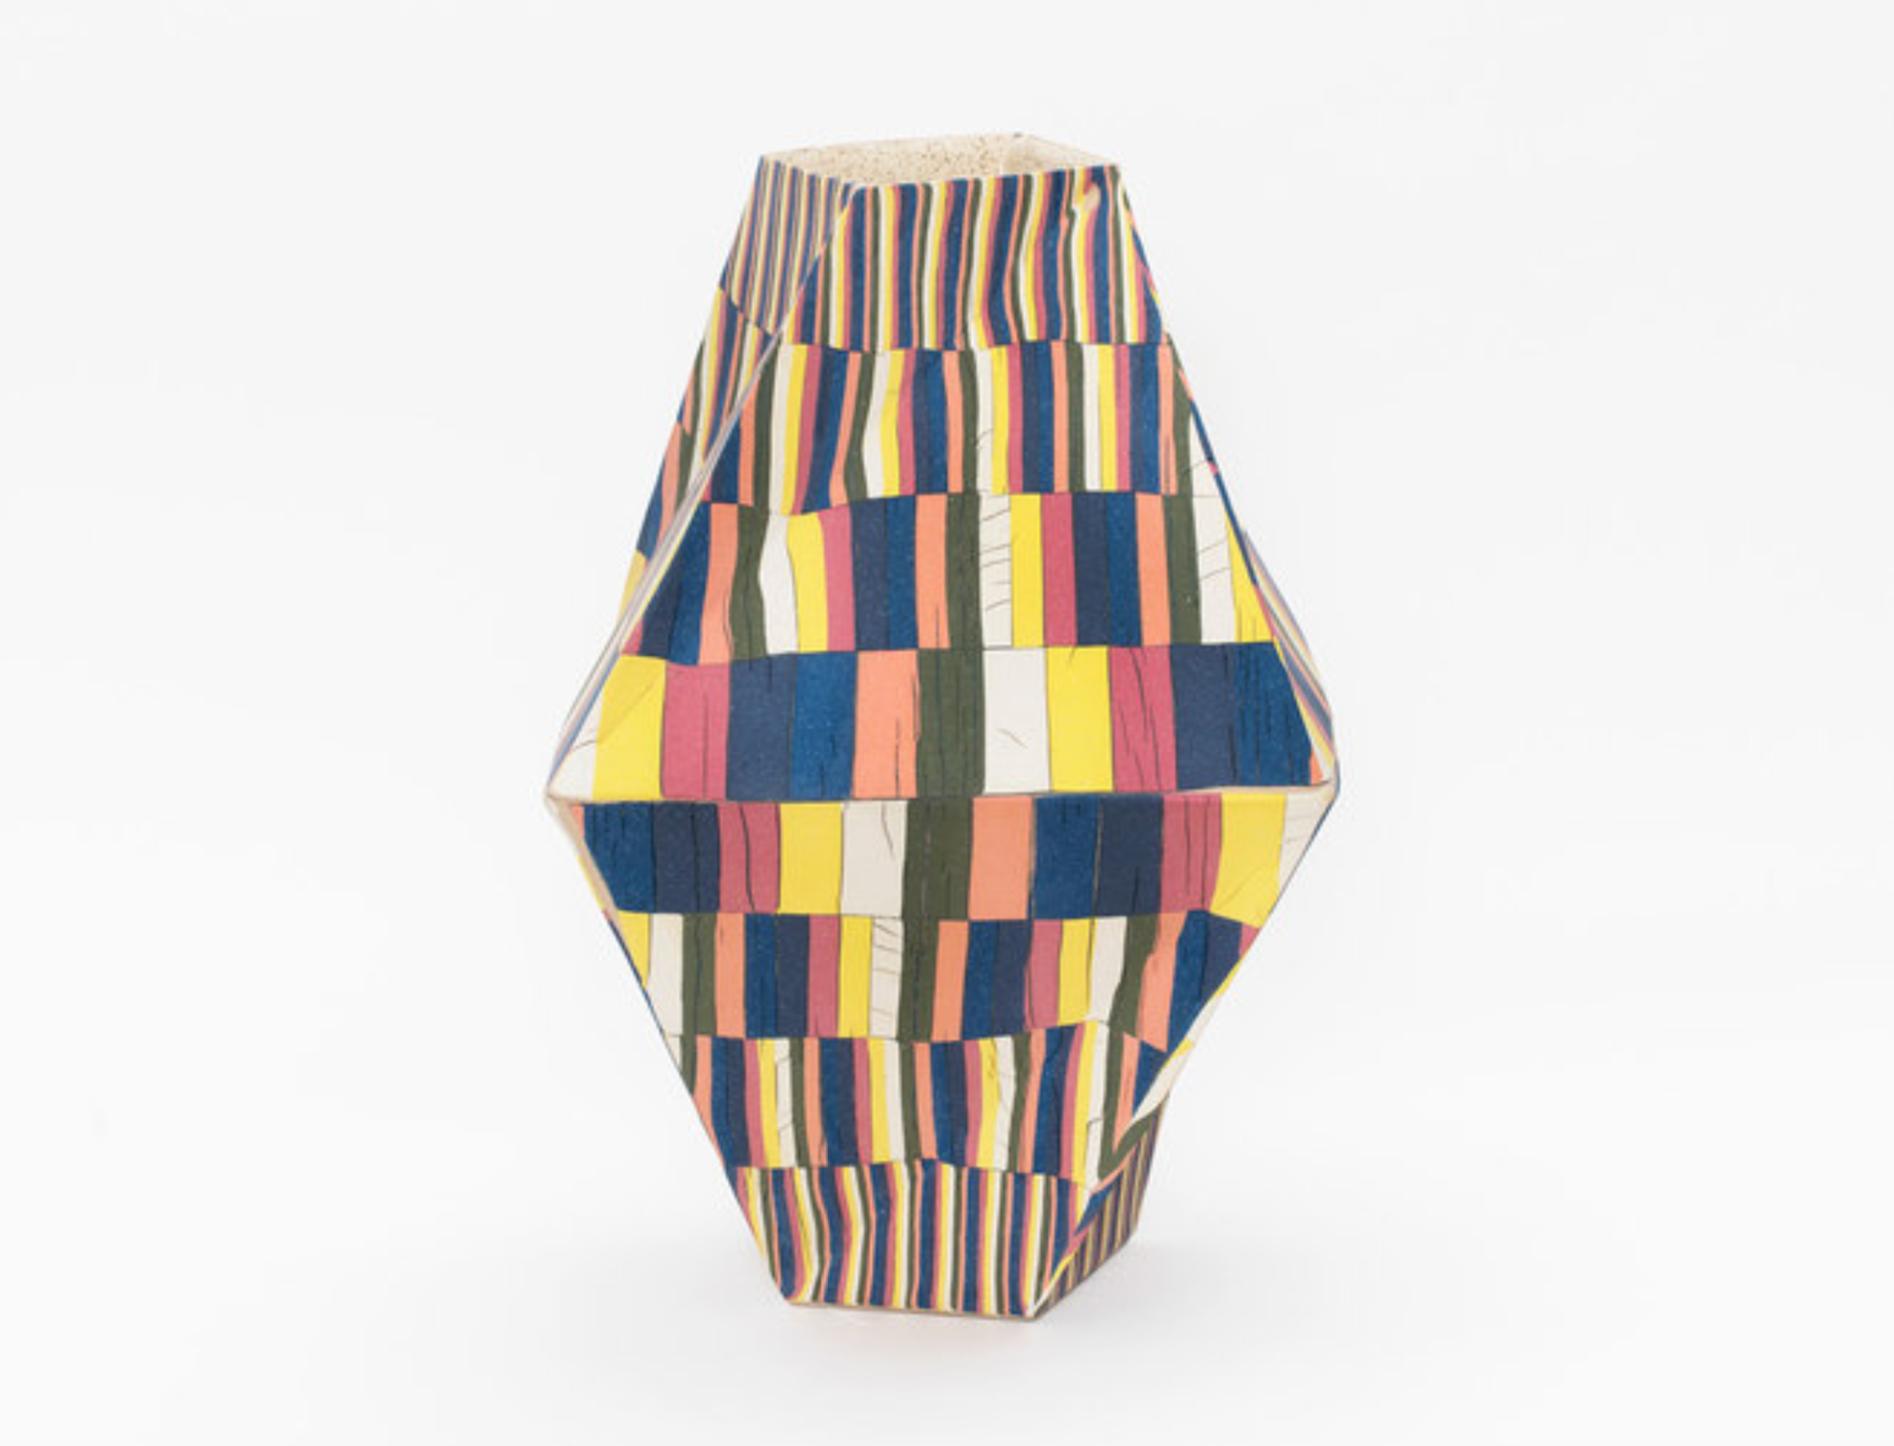 Untitled Vessel (Twisted Box)